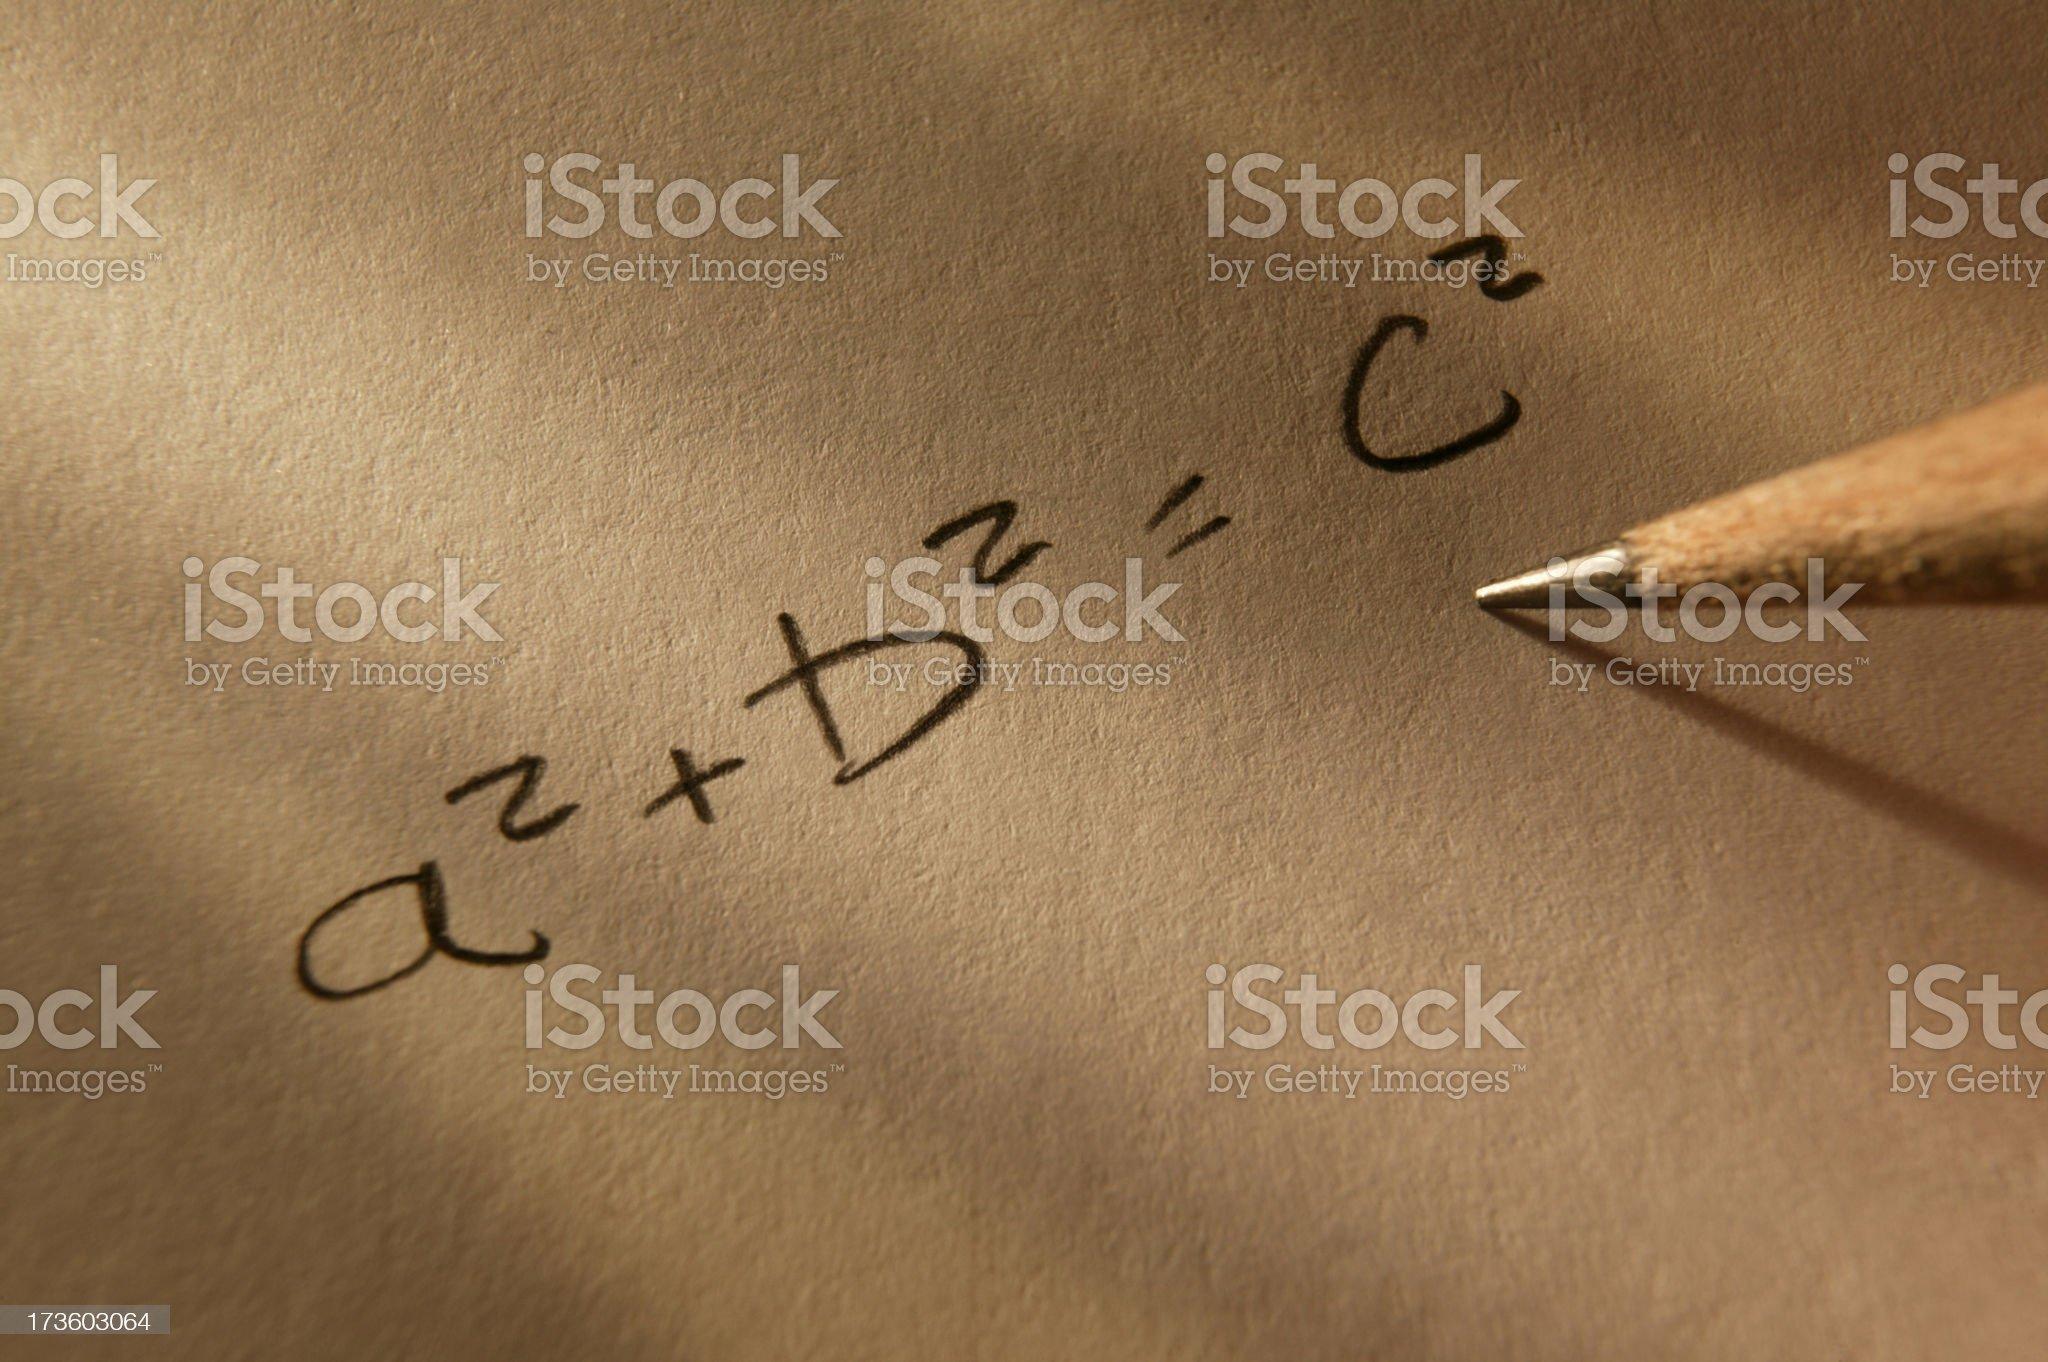 Pathagorean Theorem royalty-free stock photo